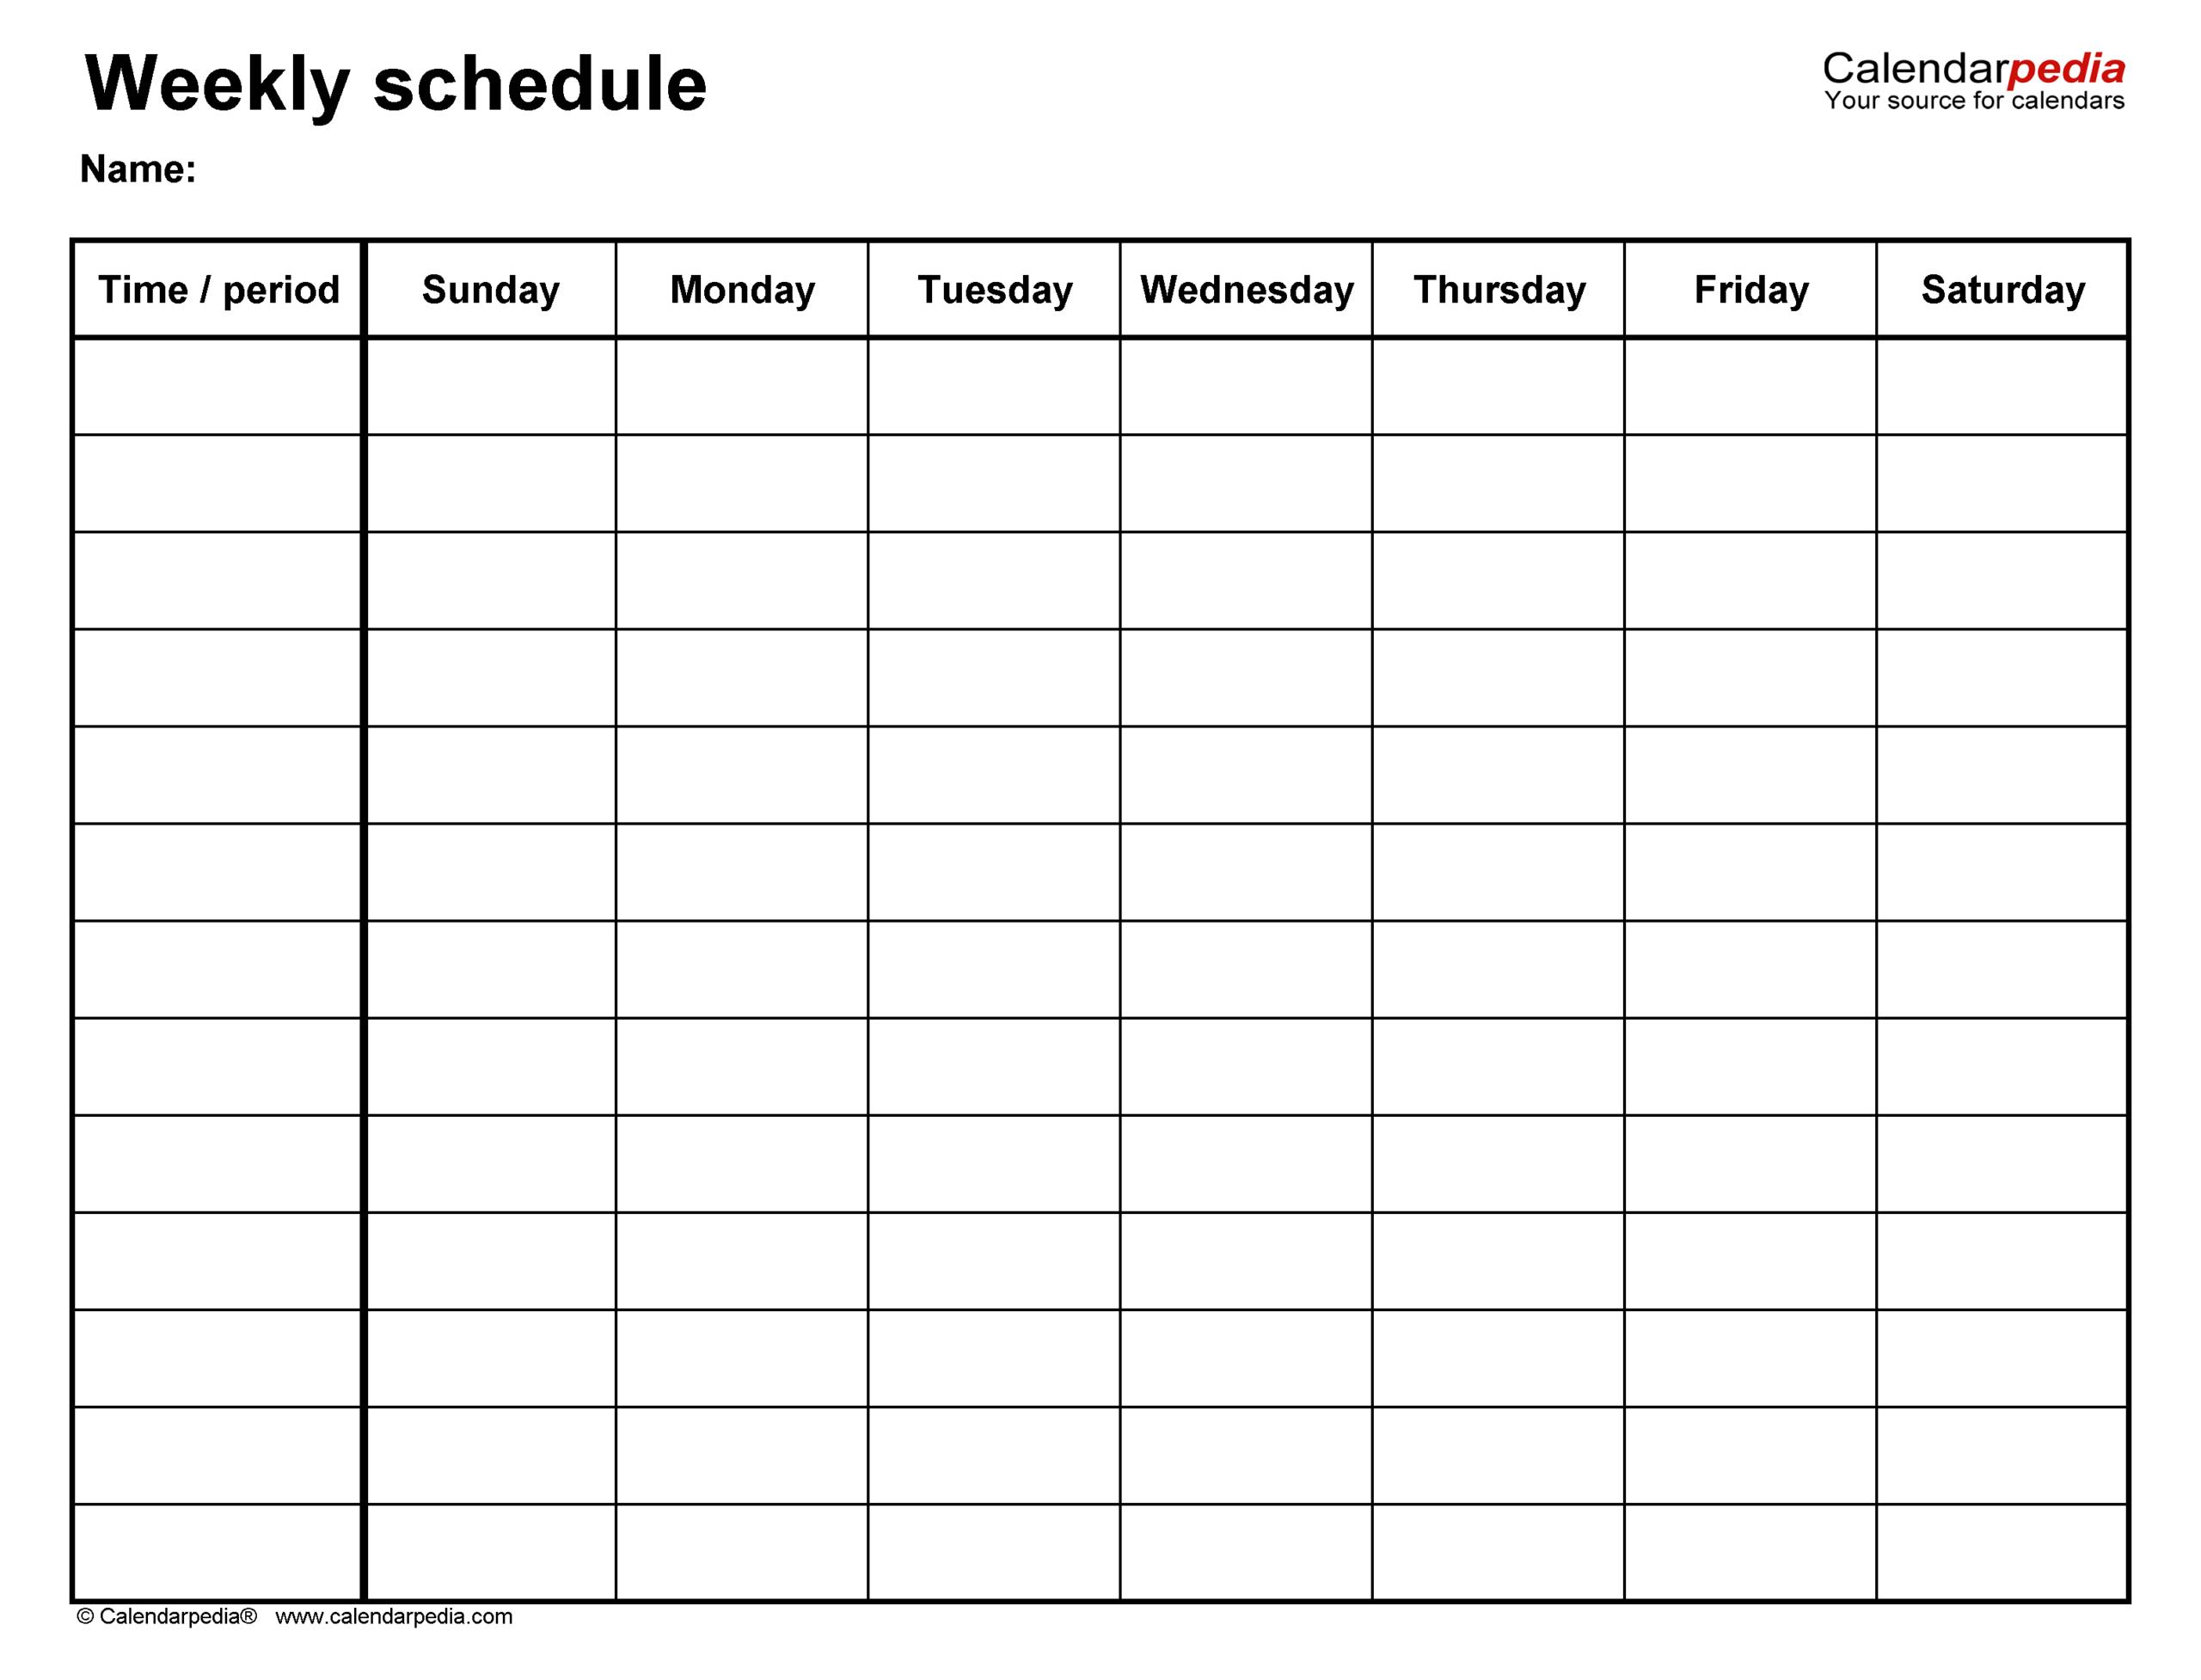 Free Weekly Schedule Templates For Word  18 Templates regarding Monday Through Saturday Calendar